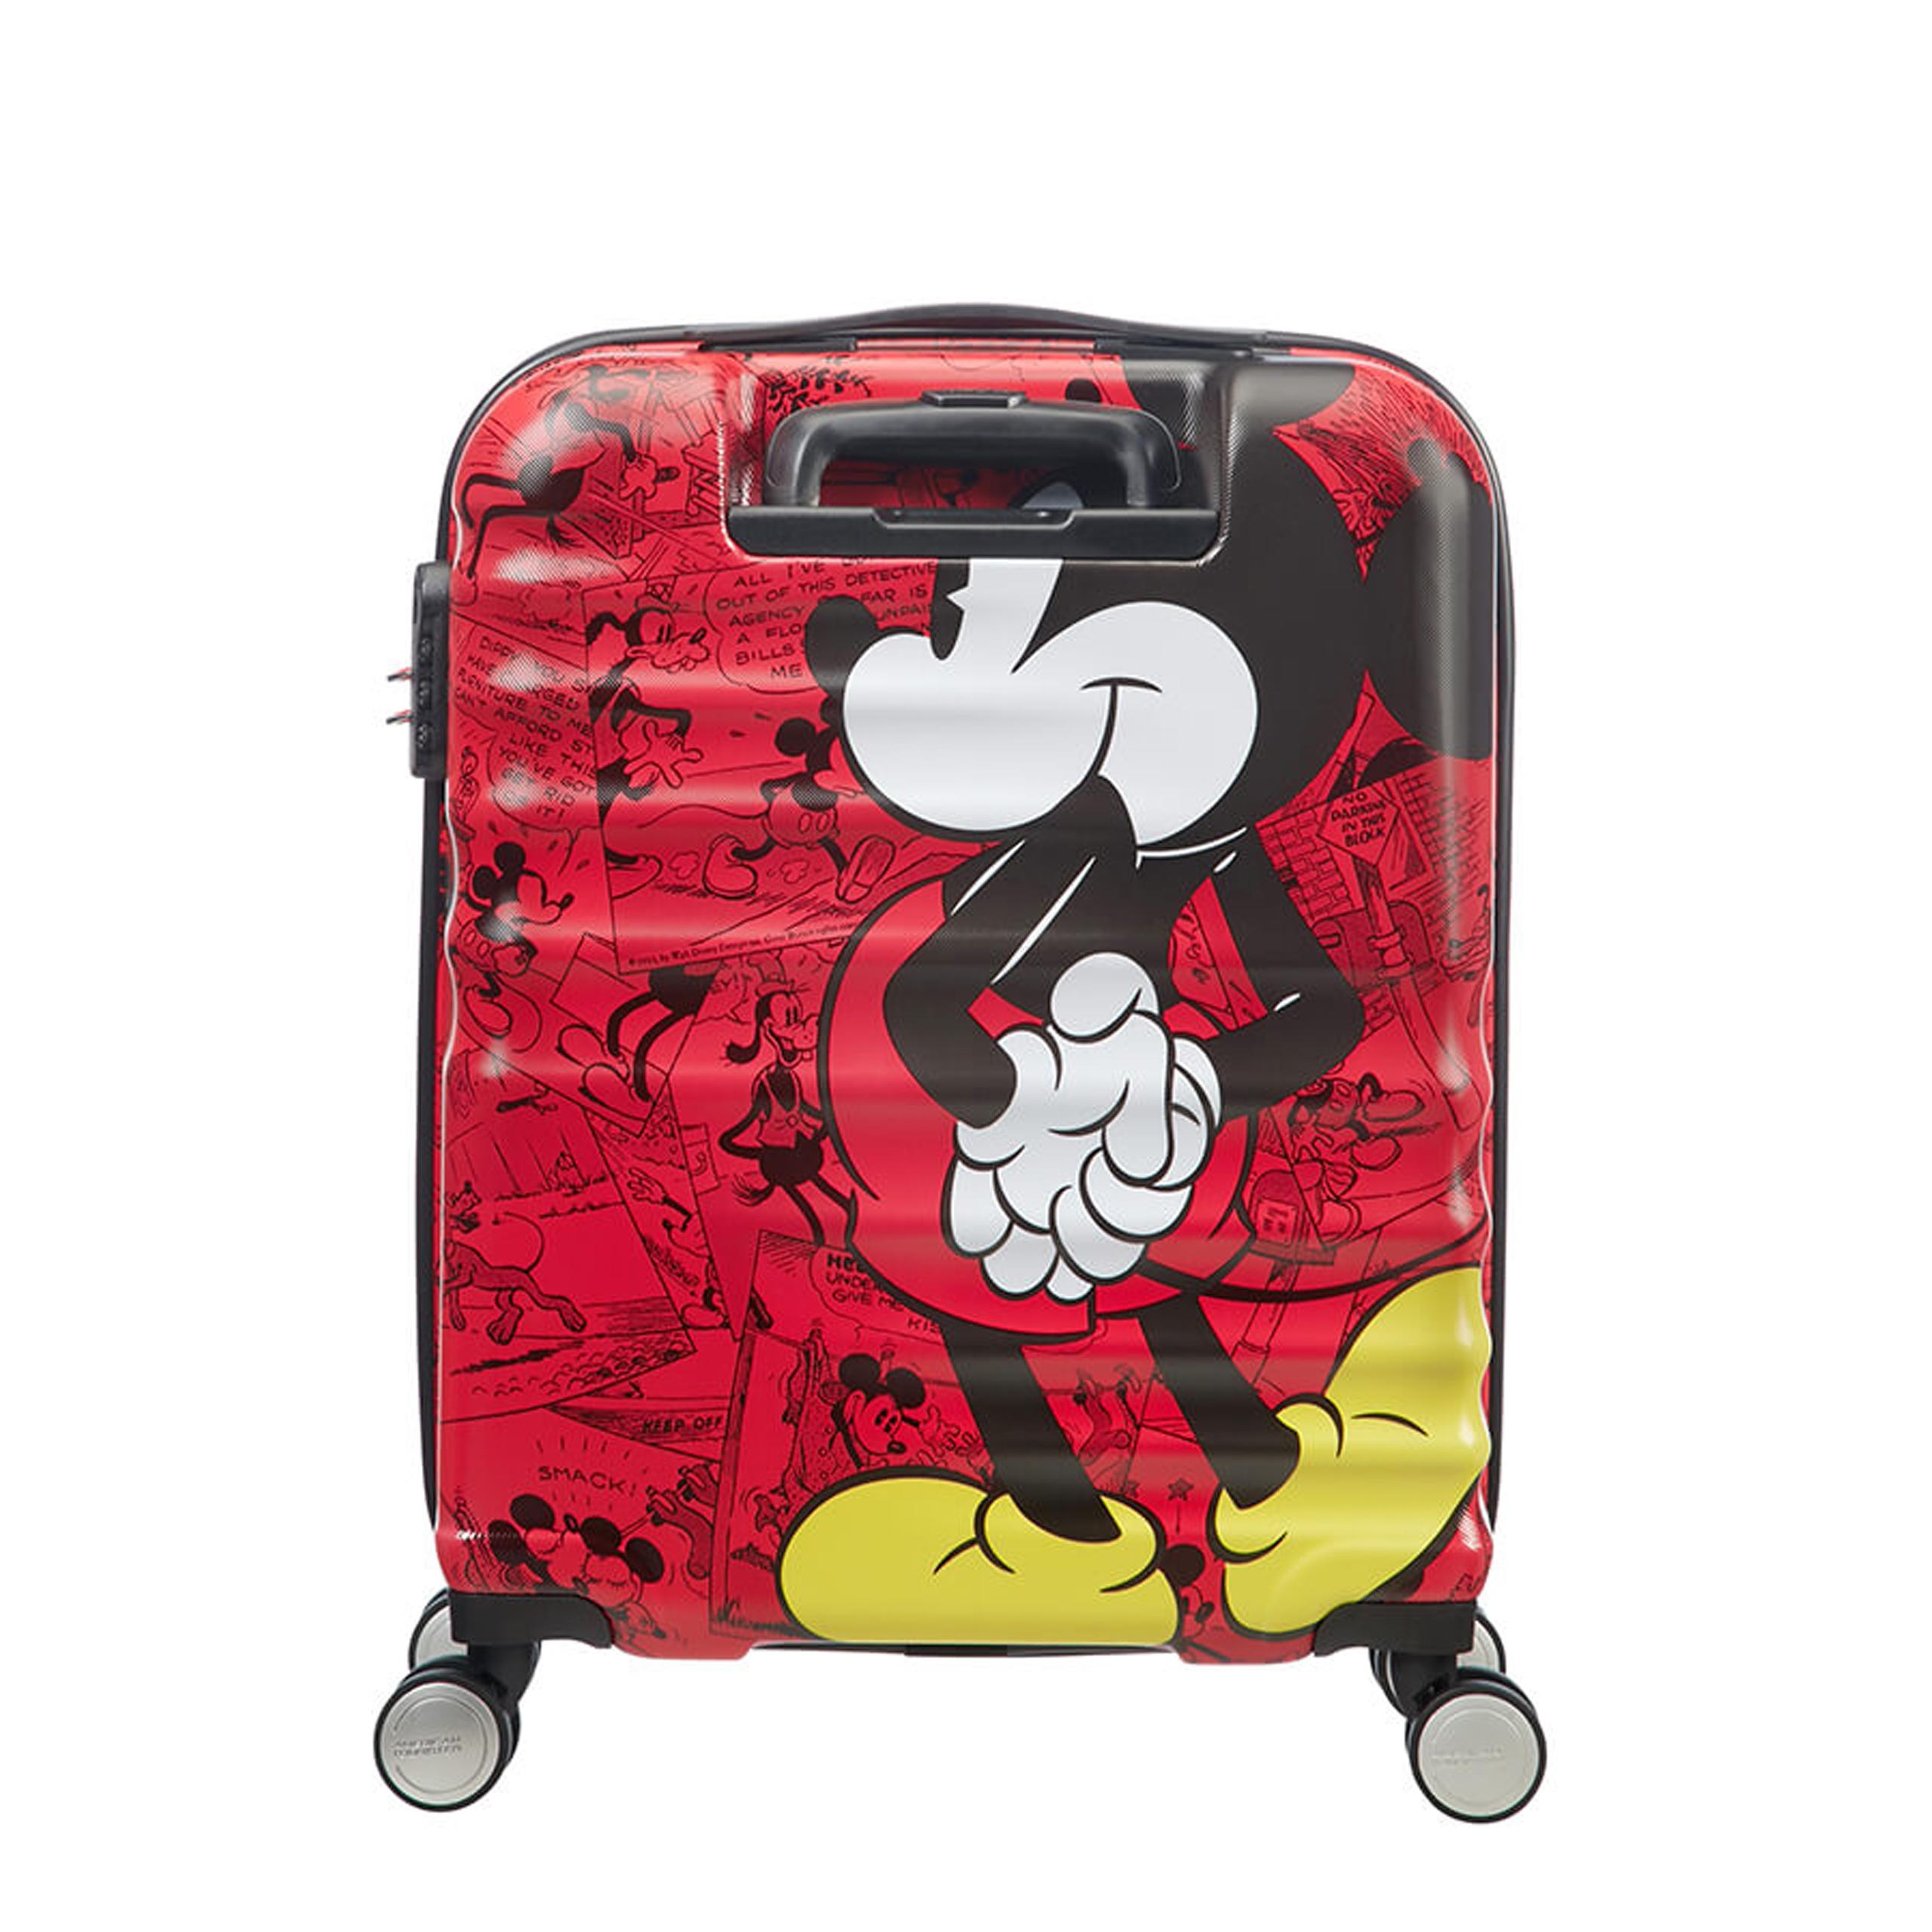 b4fb57254b65e Walizka American Tourister Wavebreaker Disney Mickey Comics Red 31C 20 001